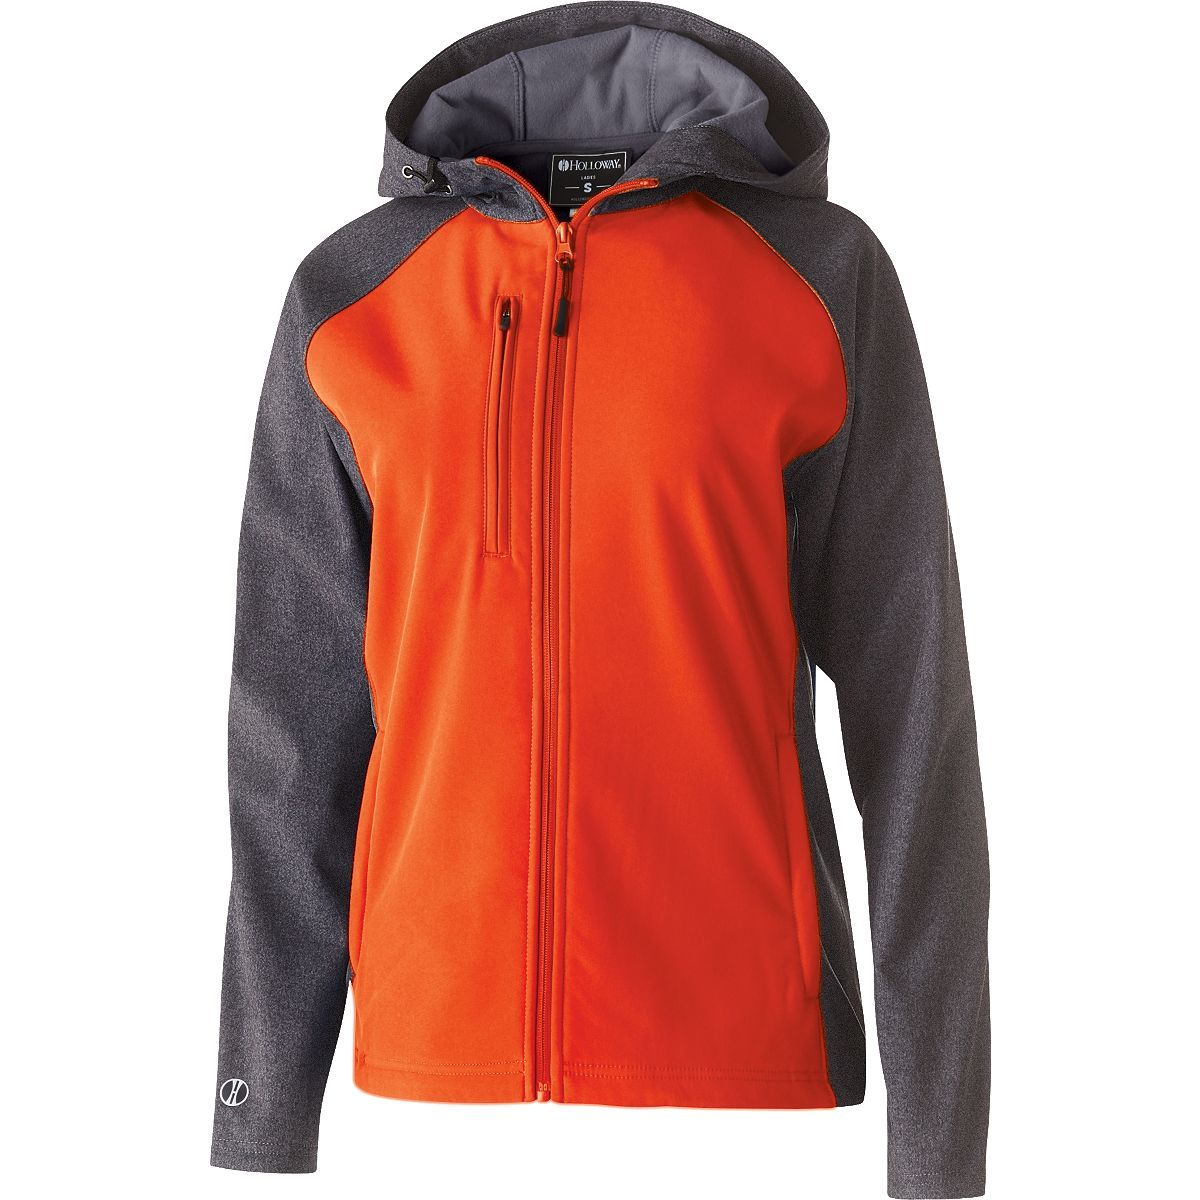 Ladies Raider Softshell Jacket - CARBON PRINT/ORANGE